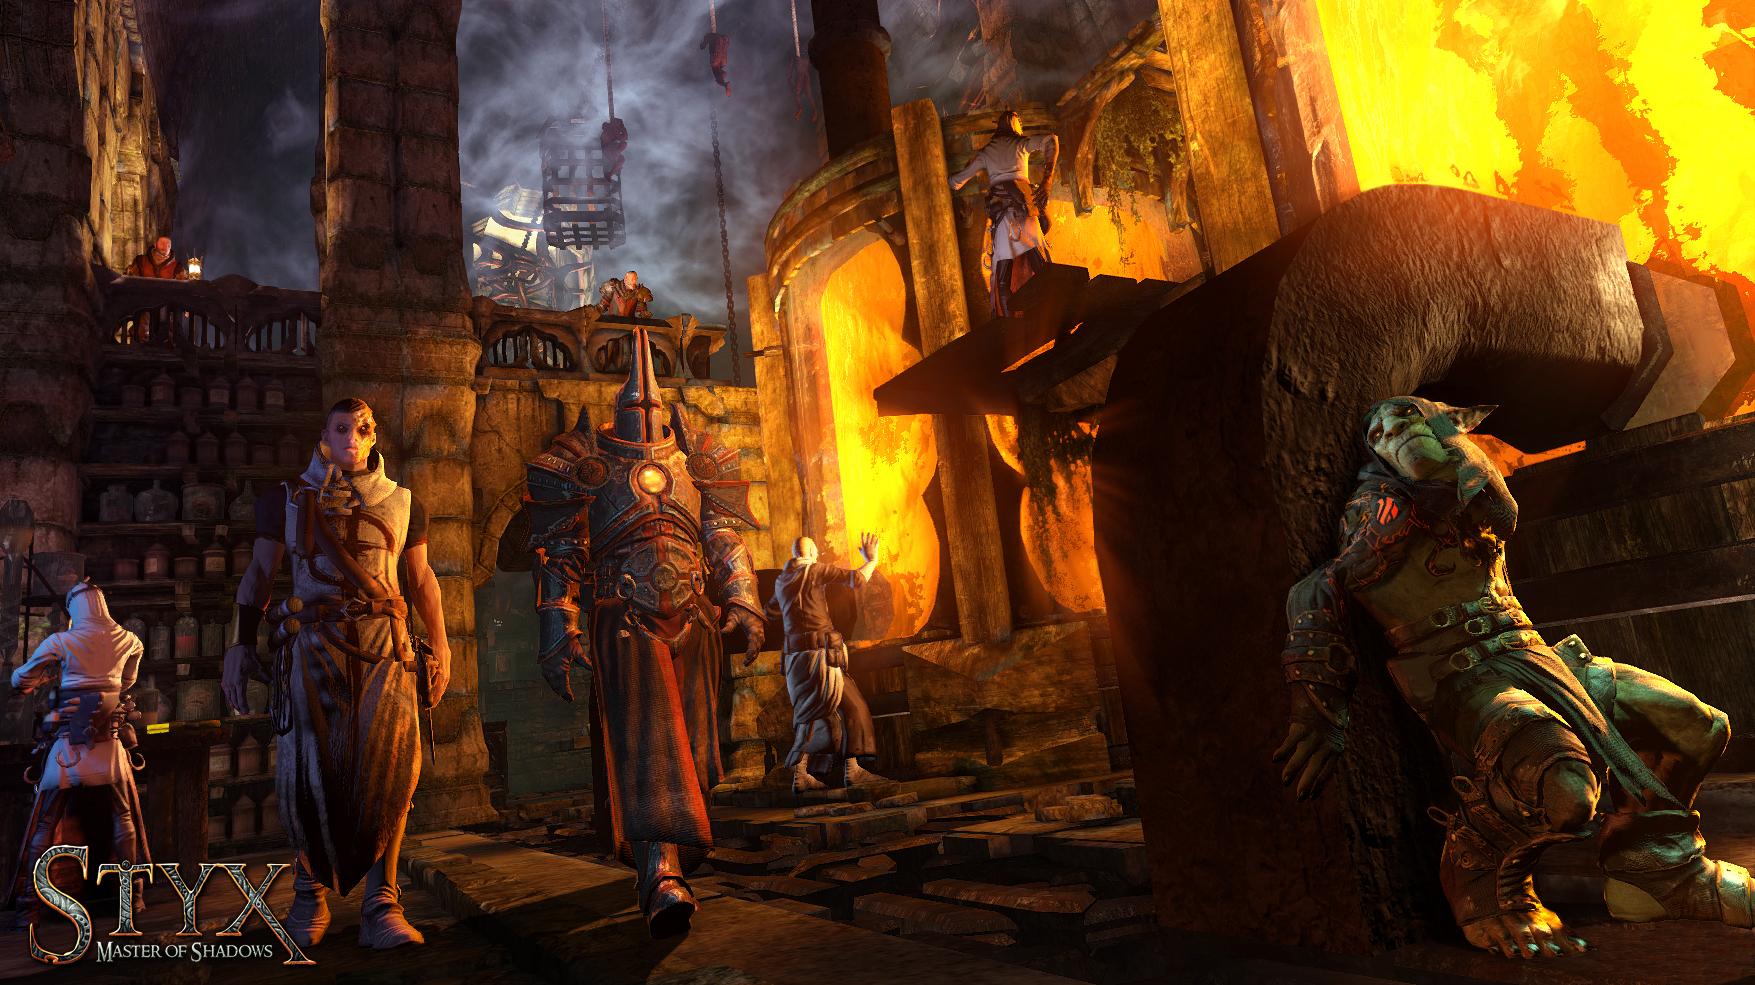 Арт к игре Styx: Master of Shadows